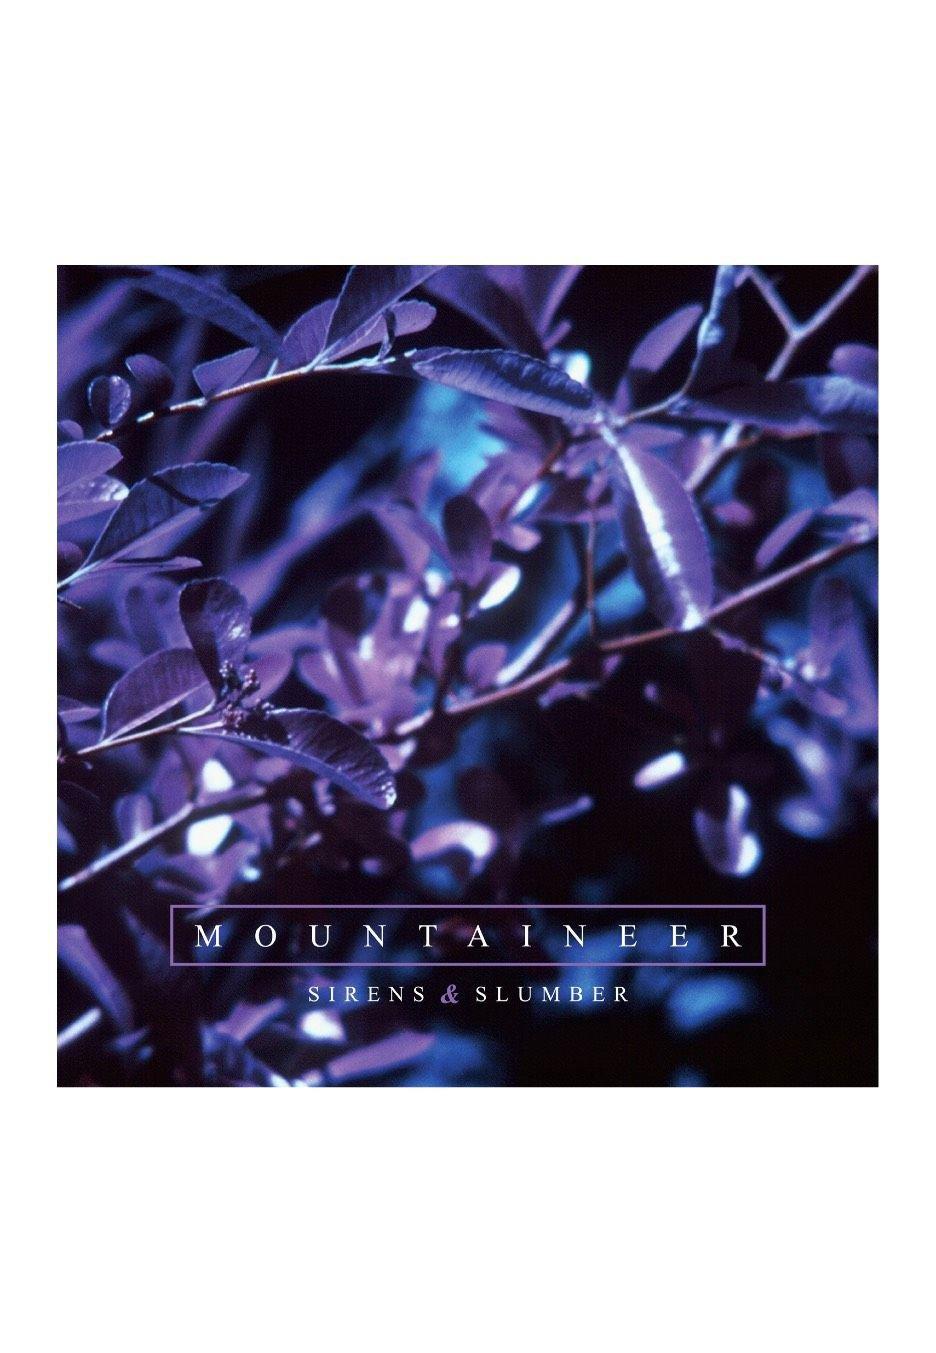 Mountaineer - Sirens & Slumber [No USA] (United Kingdom - Import)